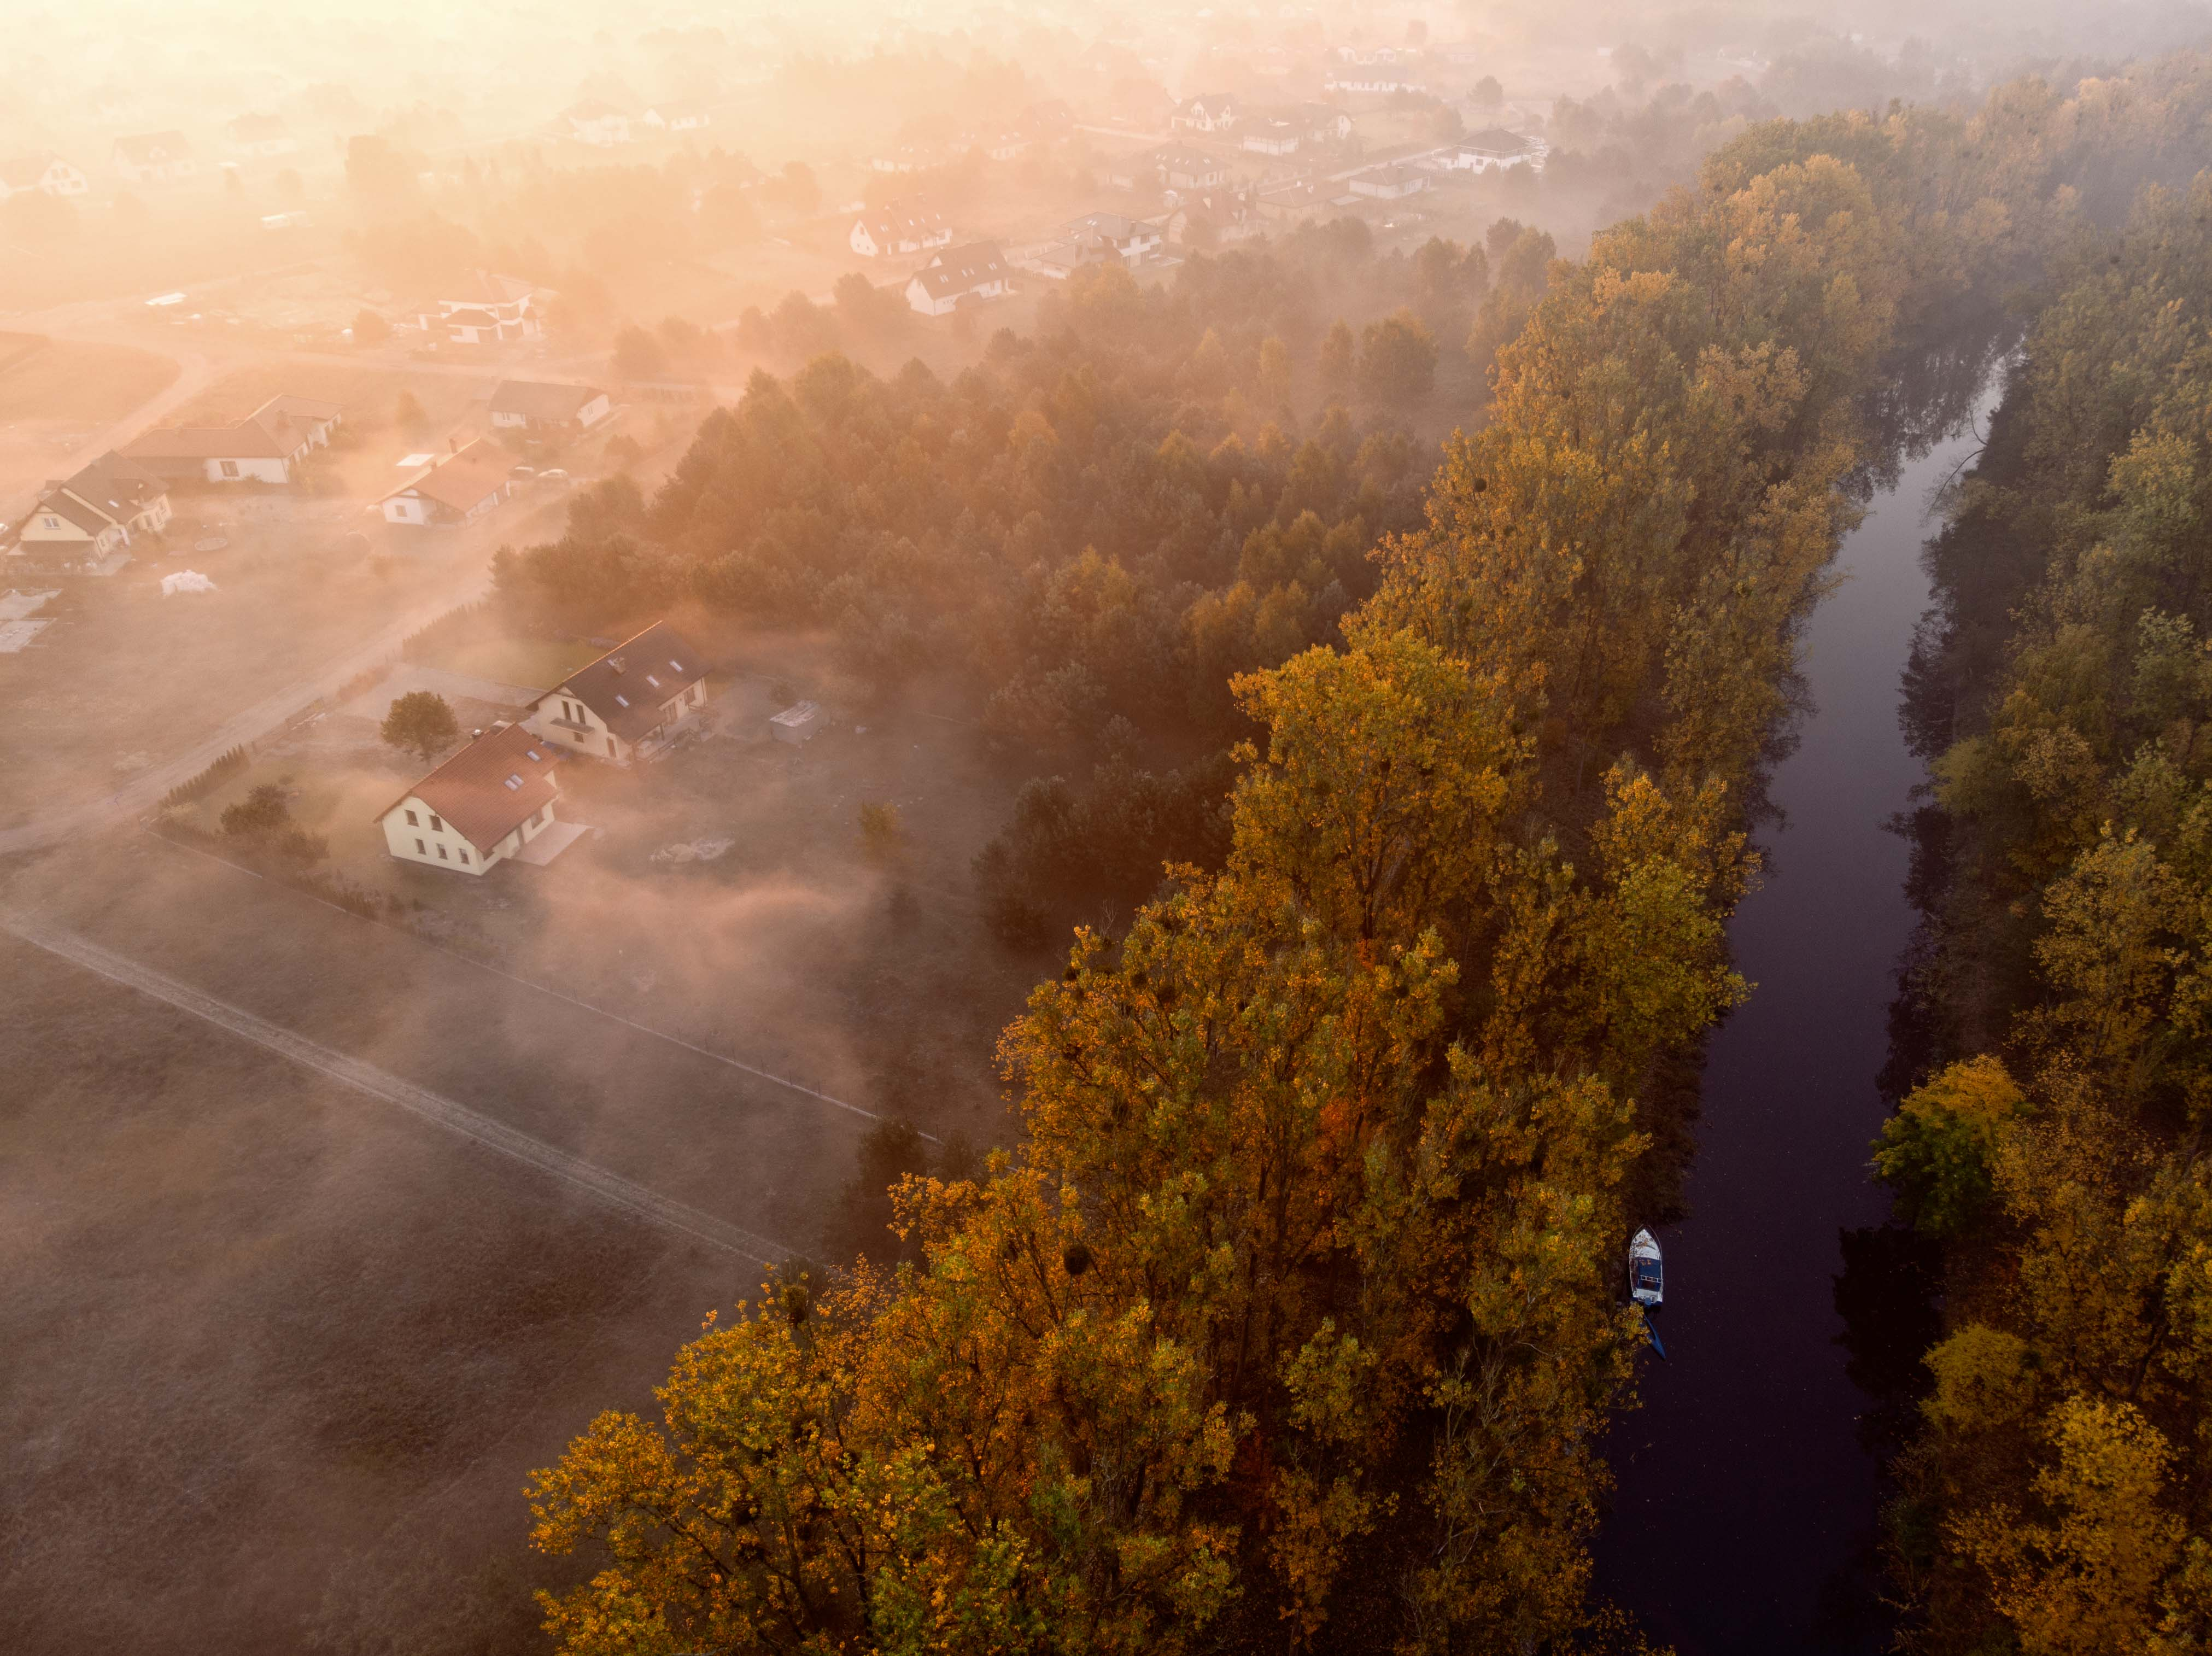 Gornonotecki Canal, Poland, Mavic Air